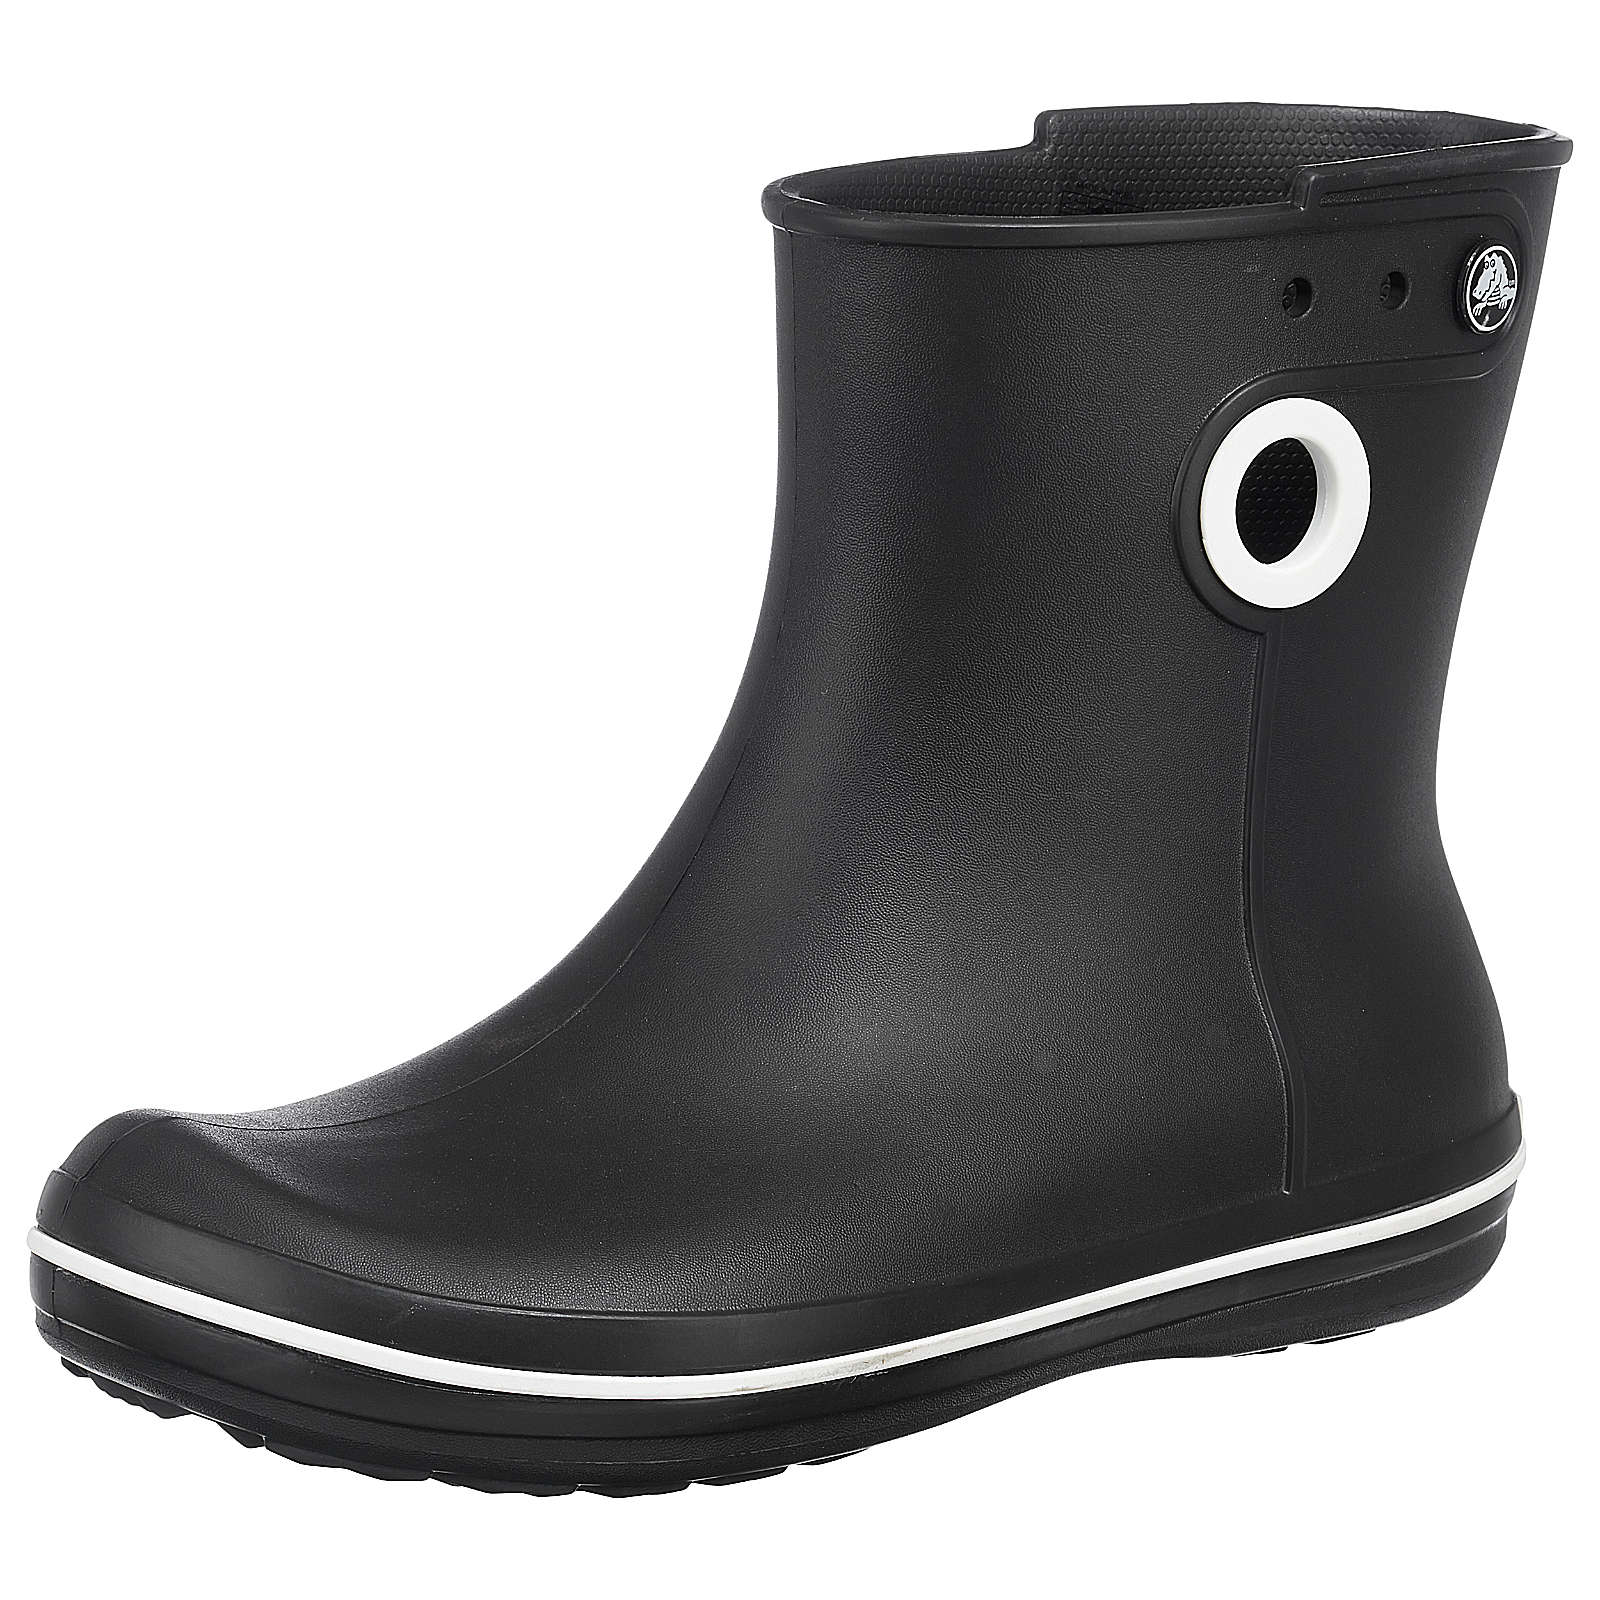 CROCS Jaunt Shorty Boot W Gummistiefel schwarz Damen Gr. 38/39